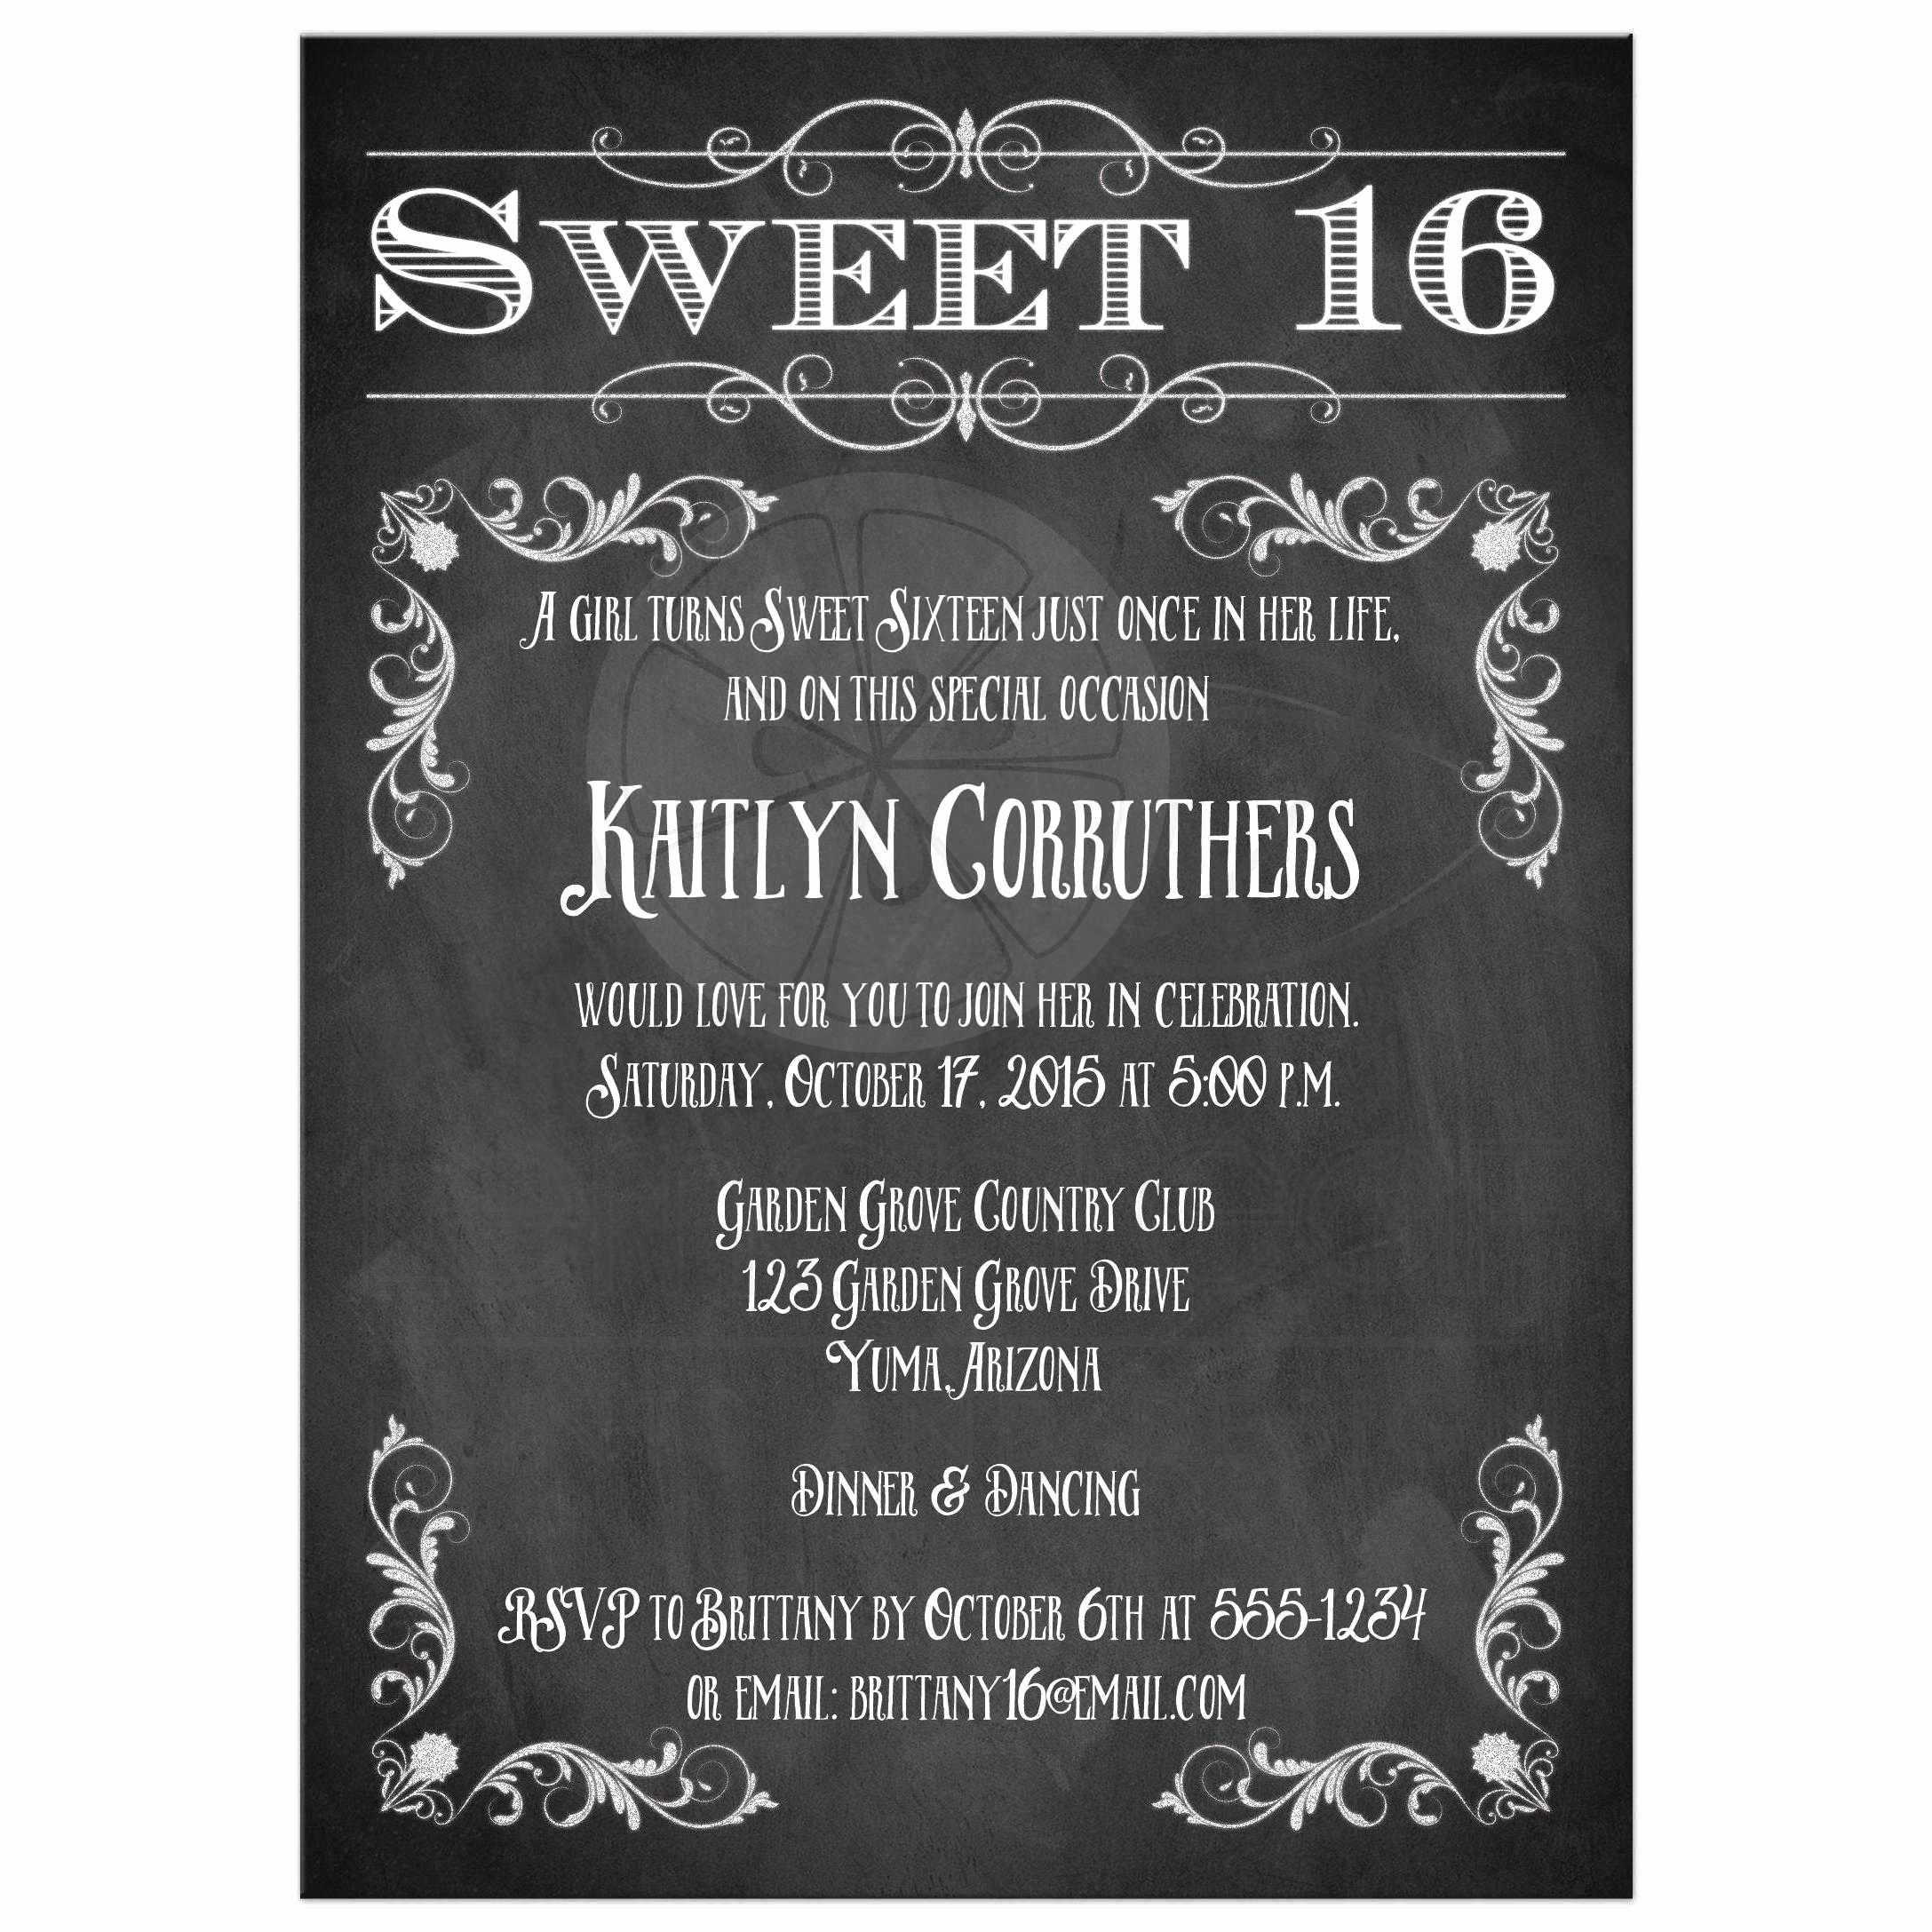 Sweet 16 Invitation Template Lovely Free Sweet 16 Birthday Invitations – Free Printable